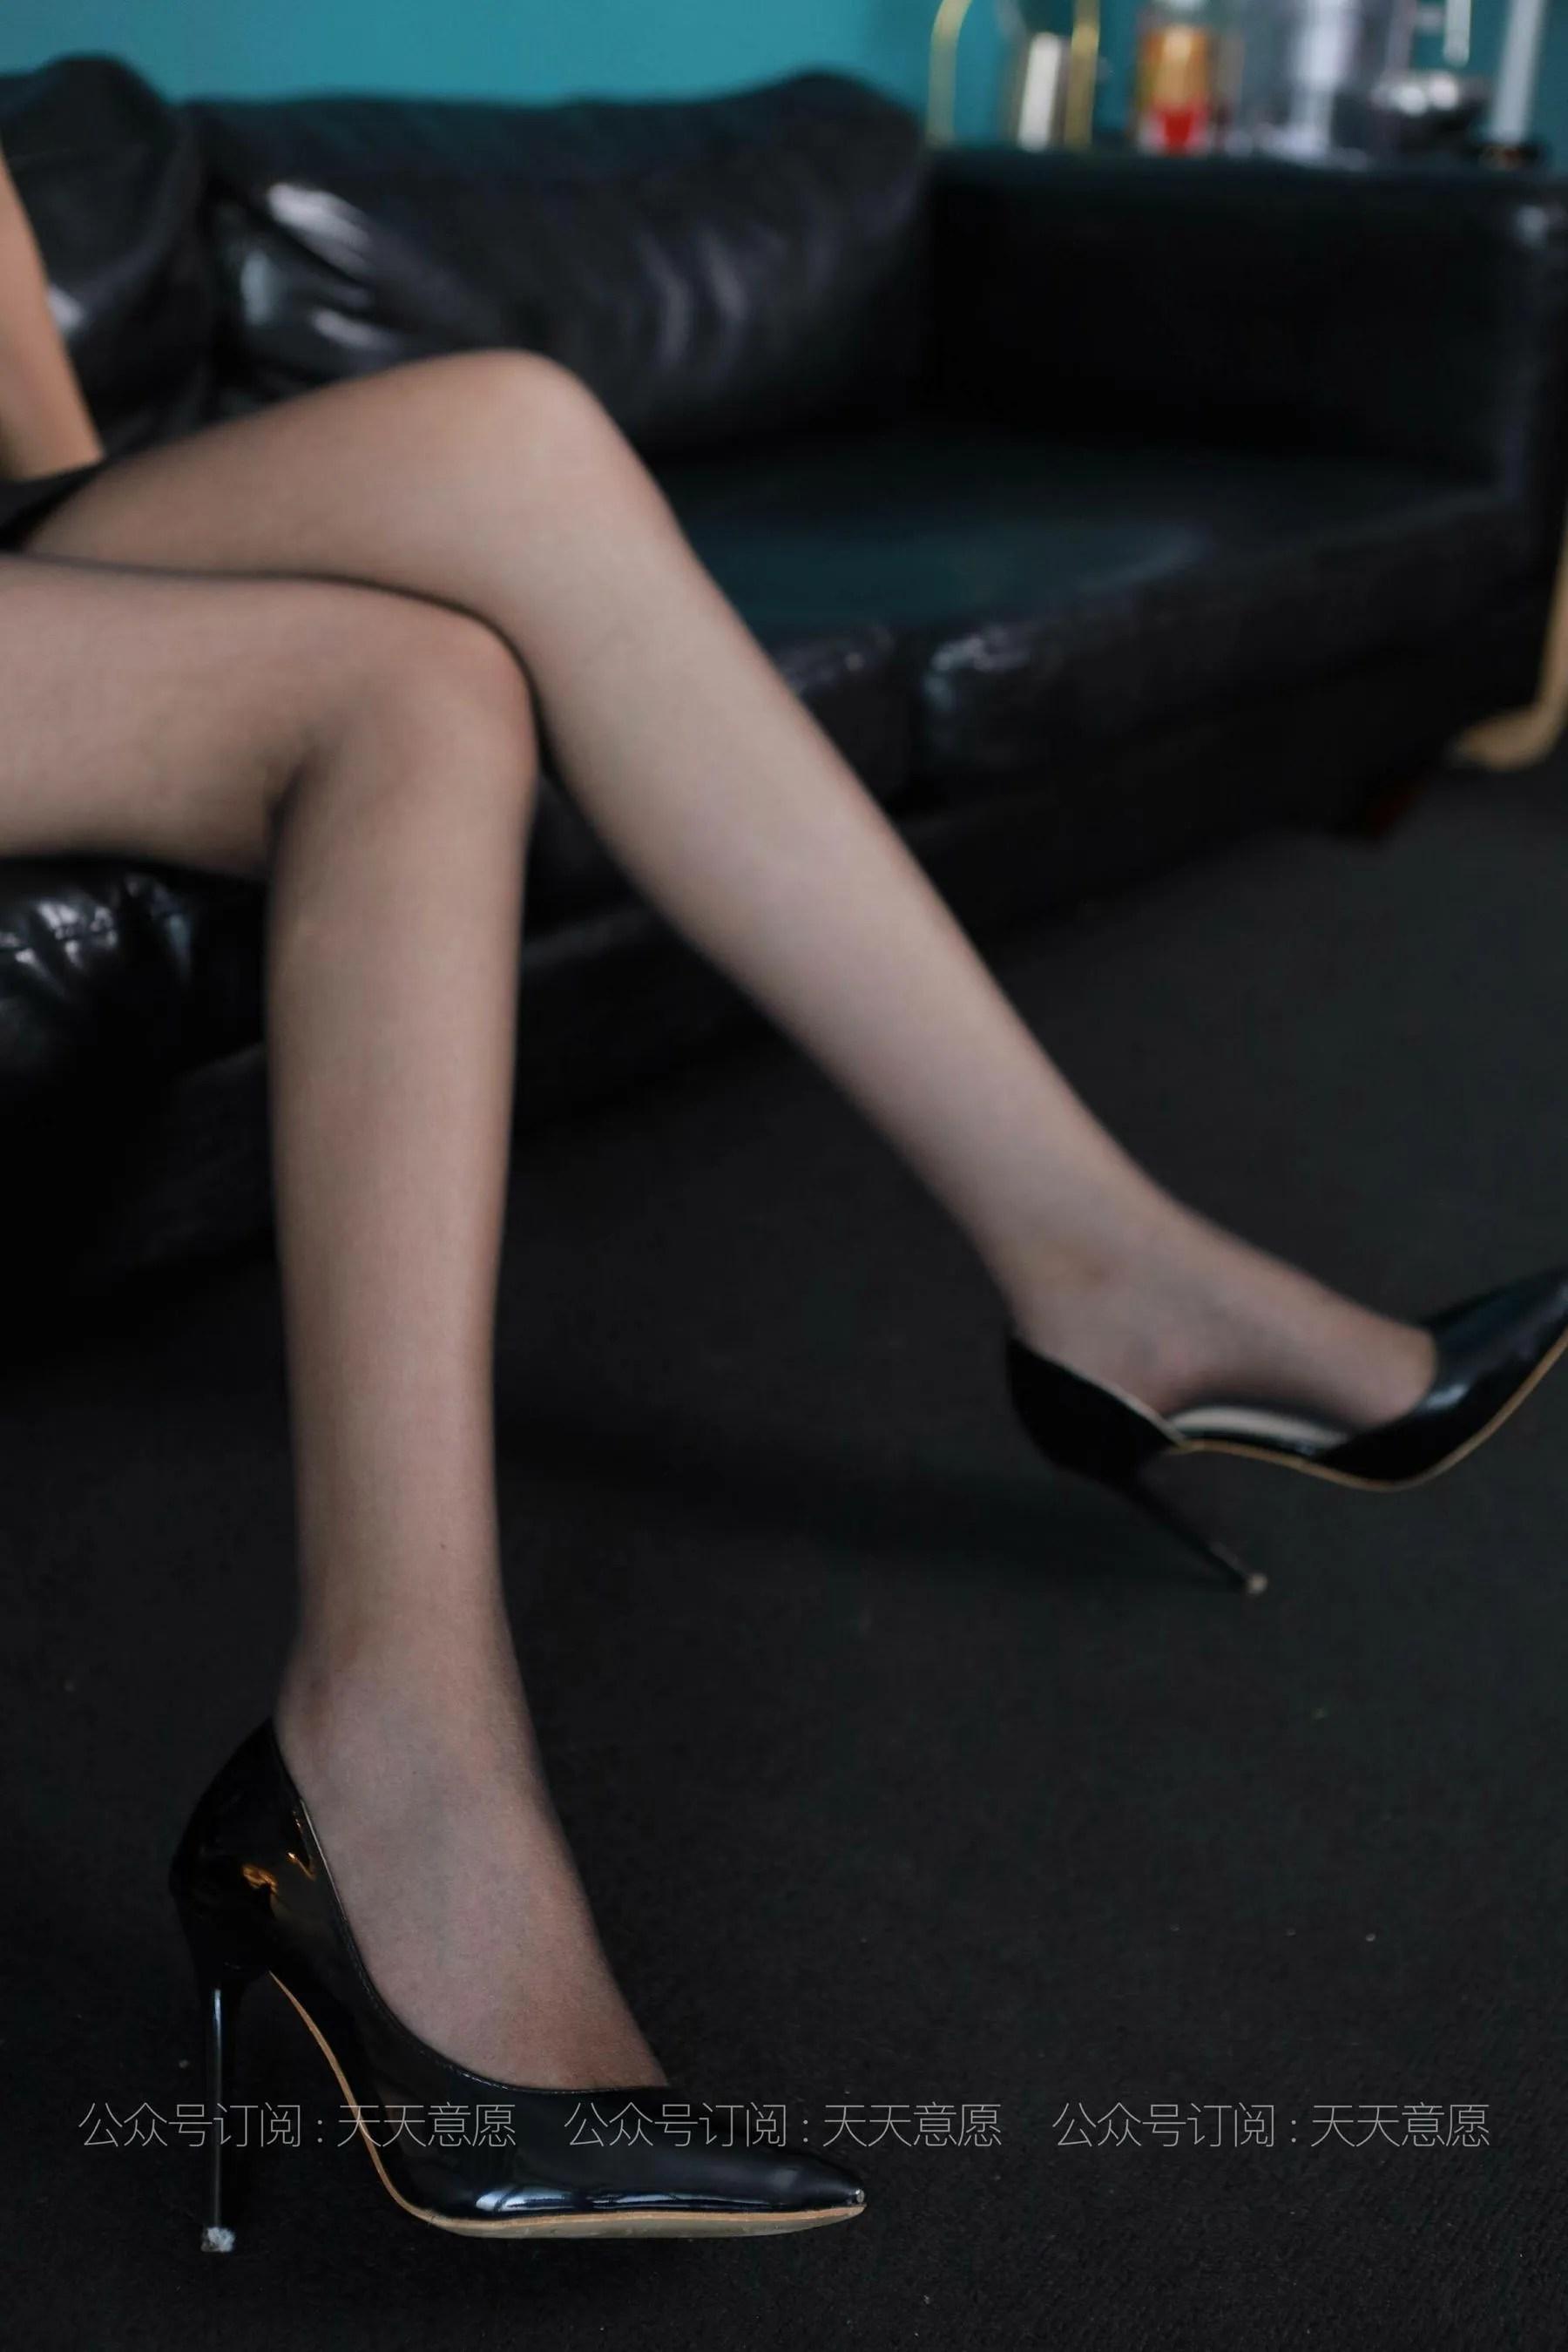 [IESS] 丝享家816: 西瓜《美腿细长直》[92P]插图(4)